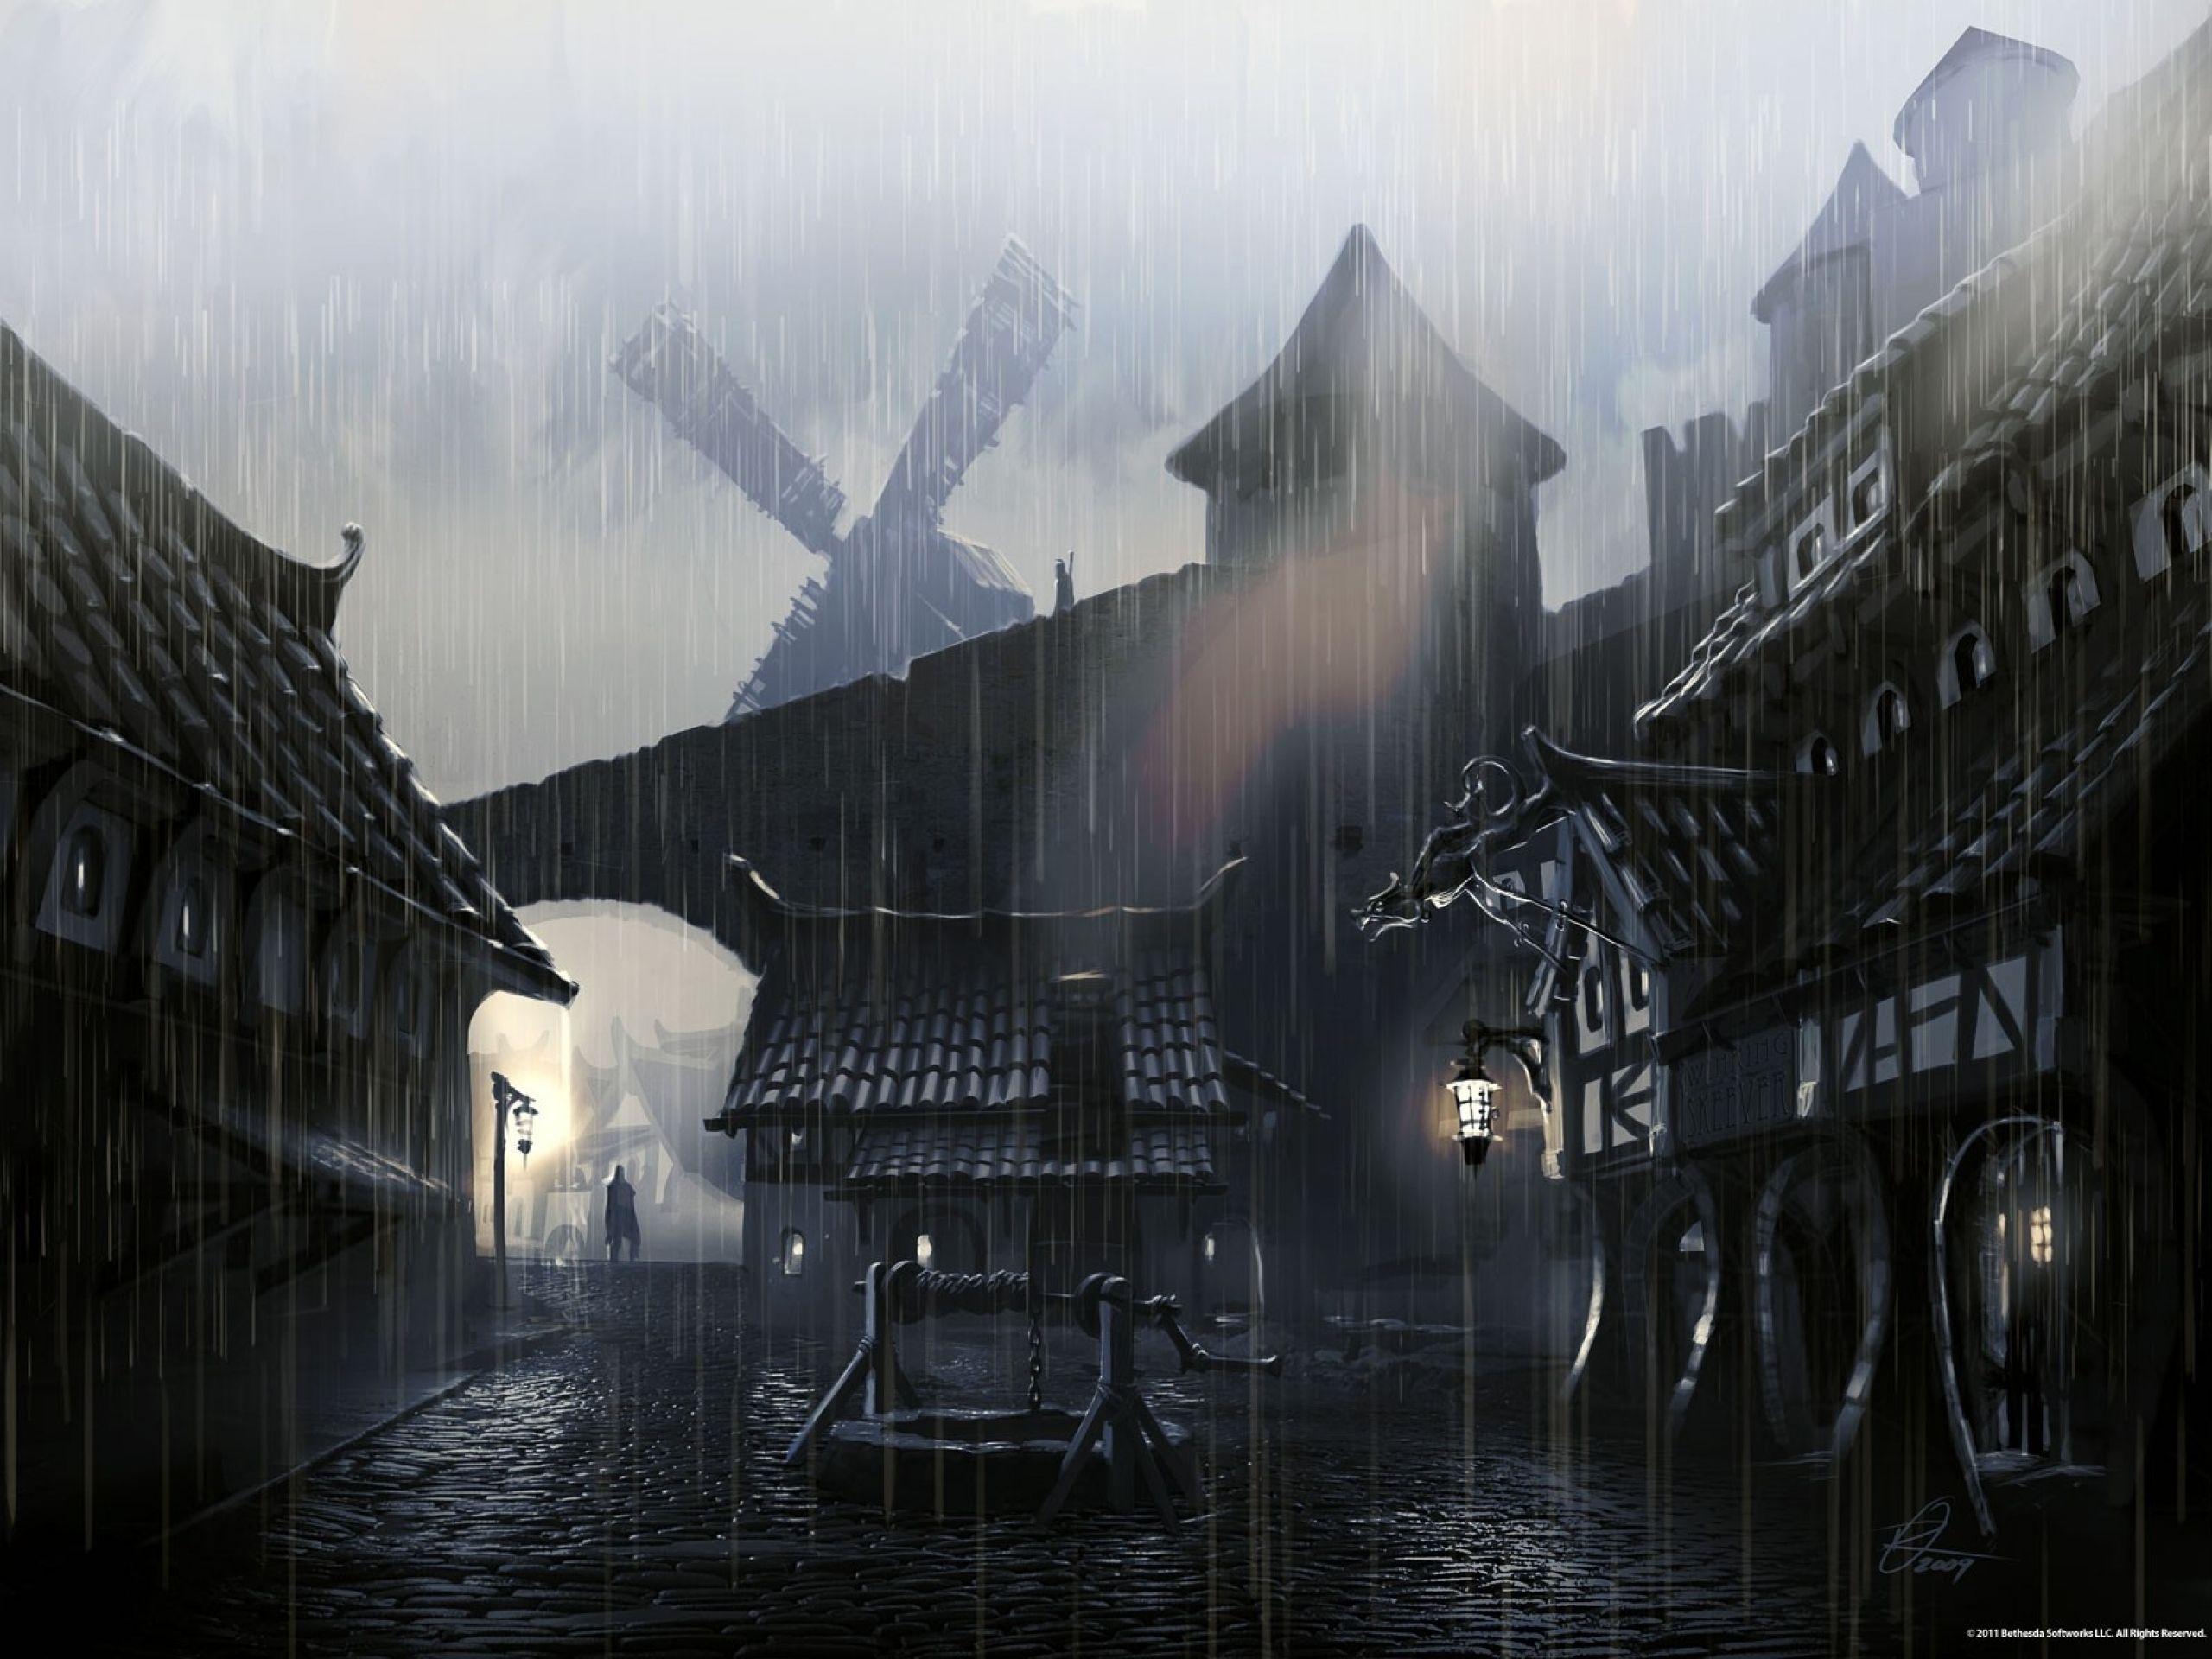 Skyrim Concept Art Wallpaper Hd